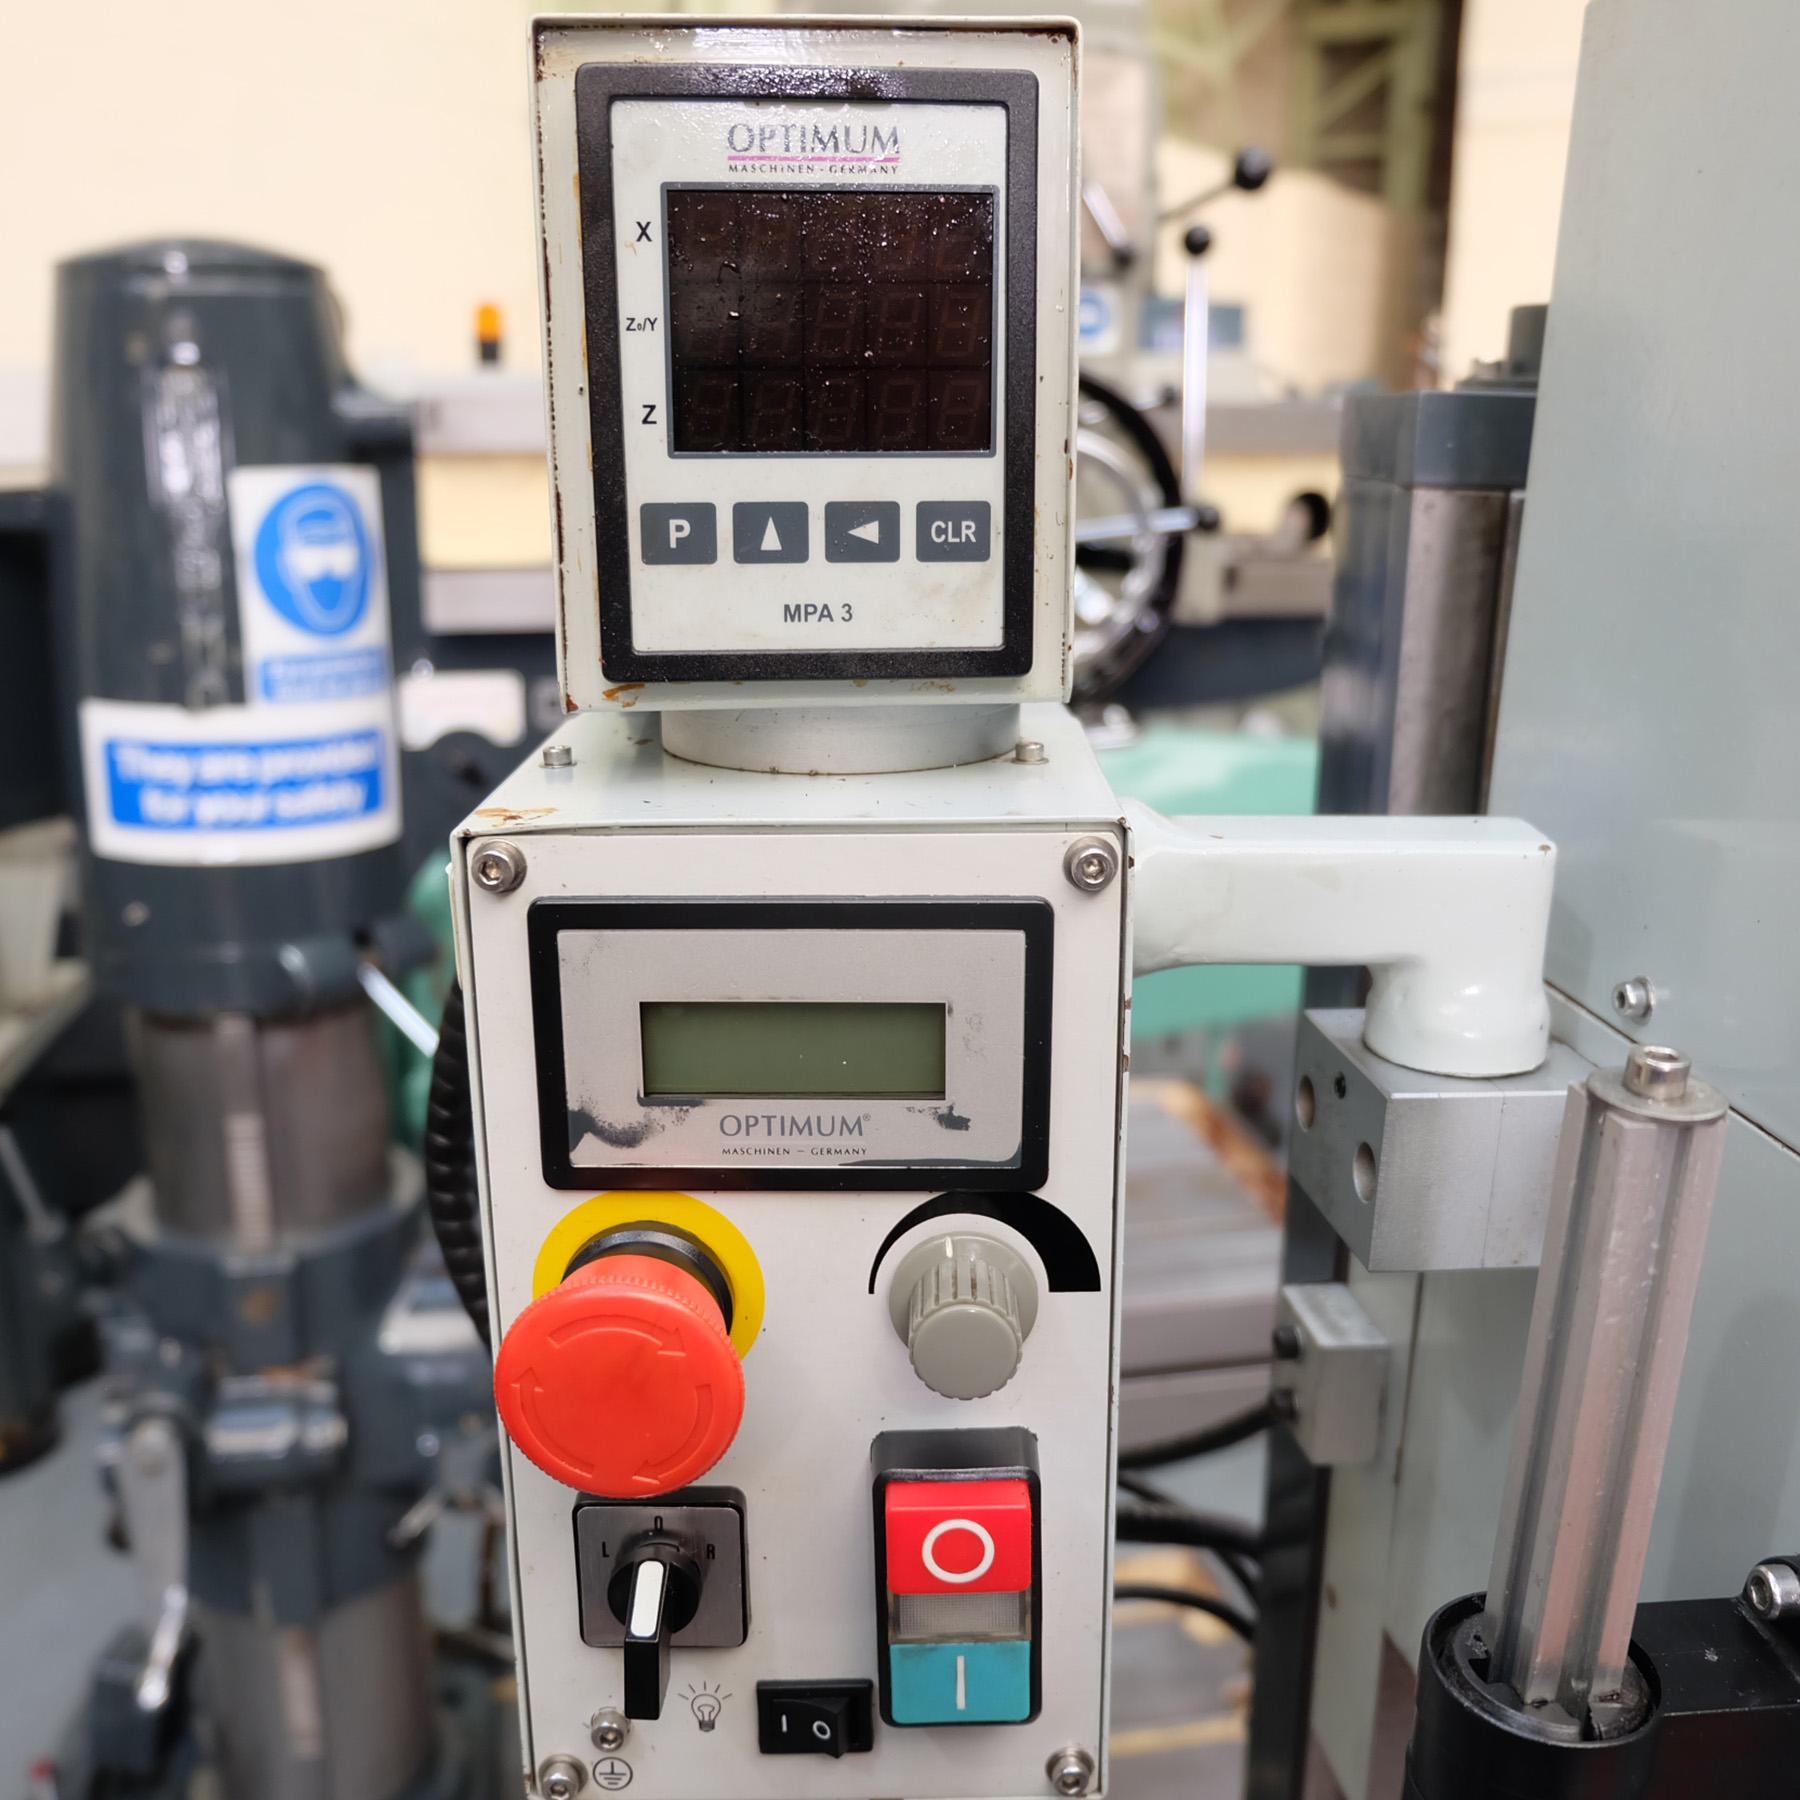 Optimum BF20 Vario Drilling/Milling Machine. - Image 5 of 11